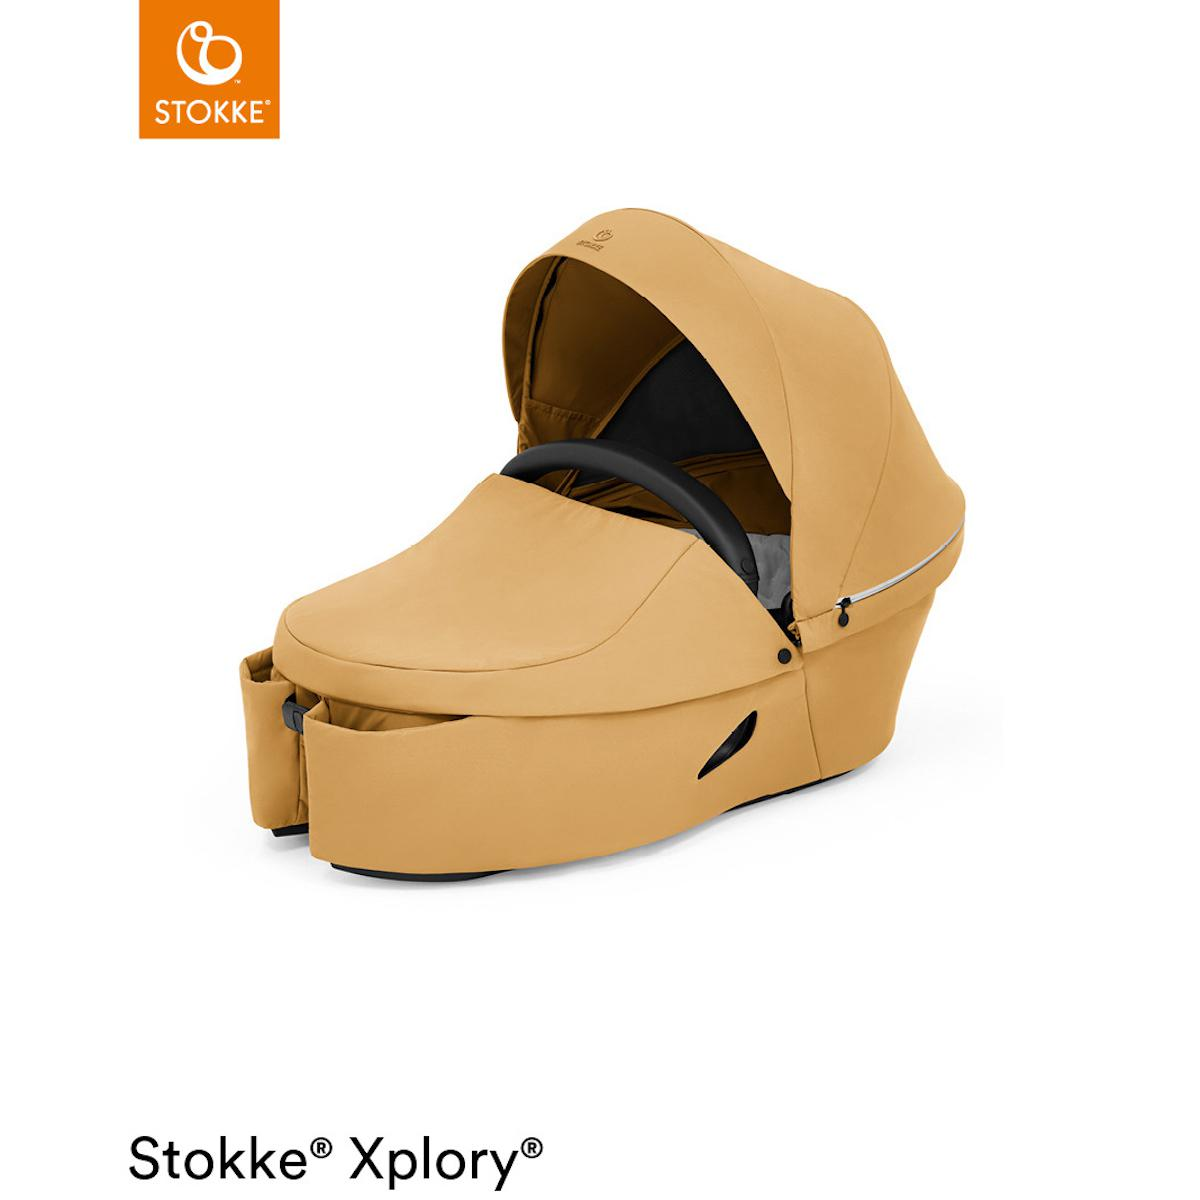 Babyschale XPLORY X Stokke Golden Yellow